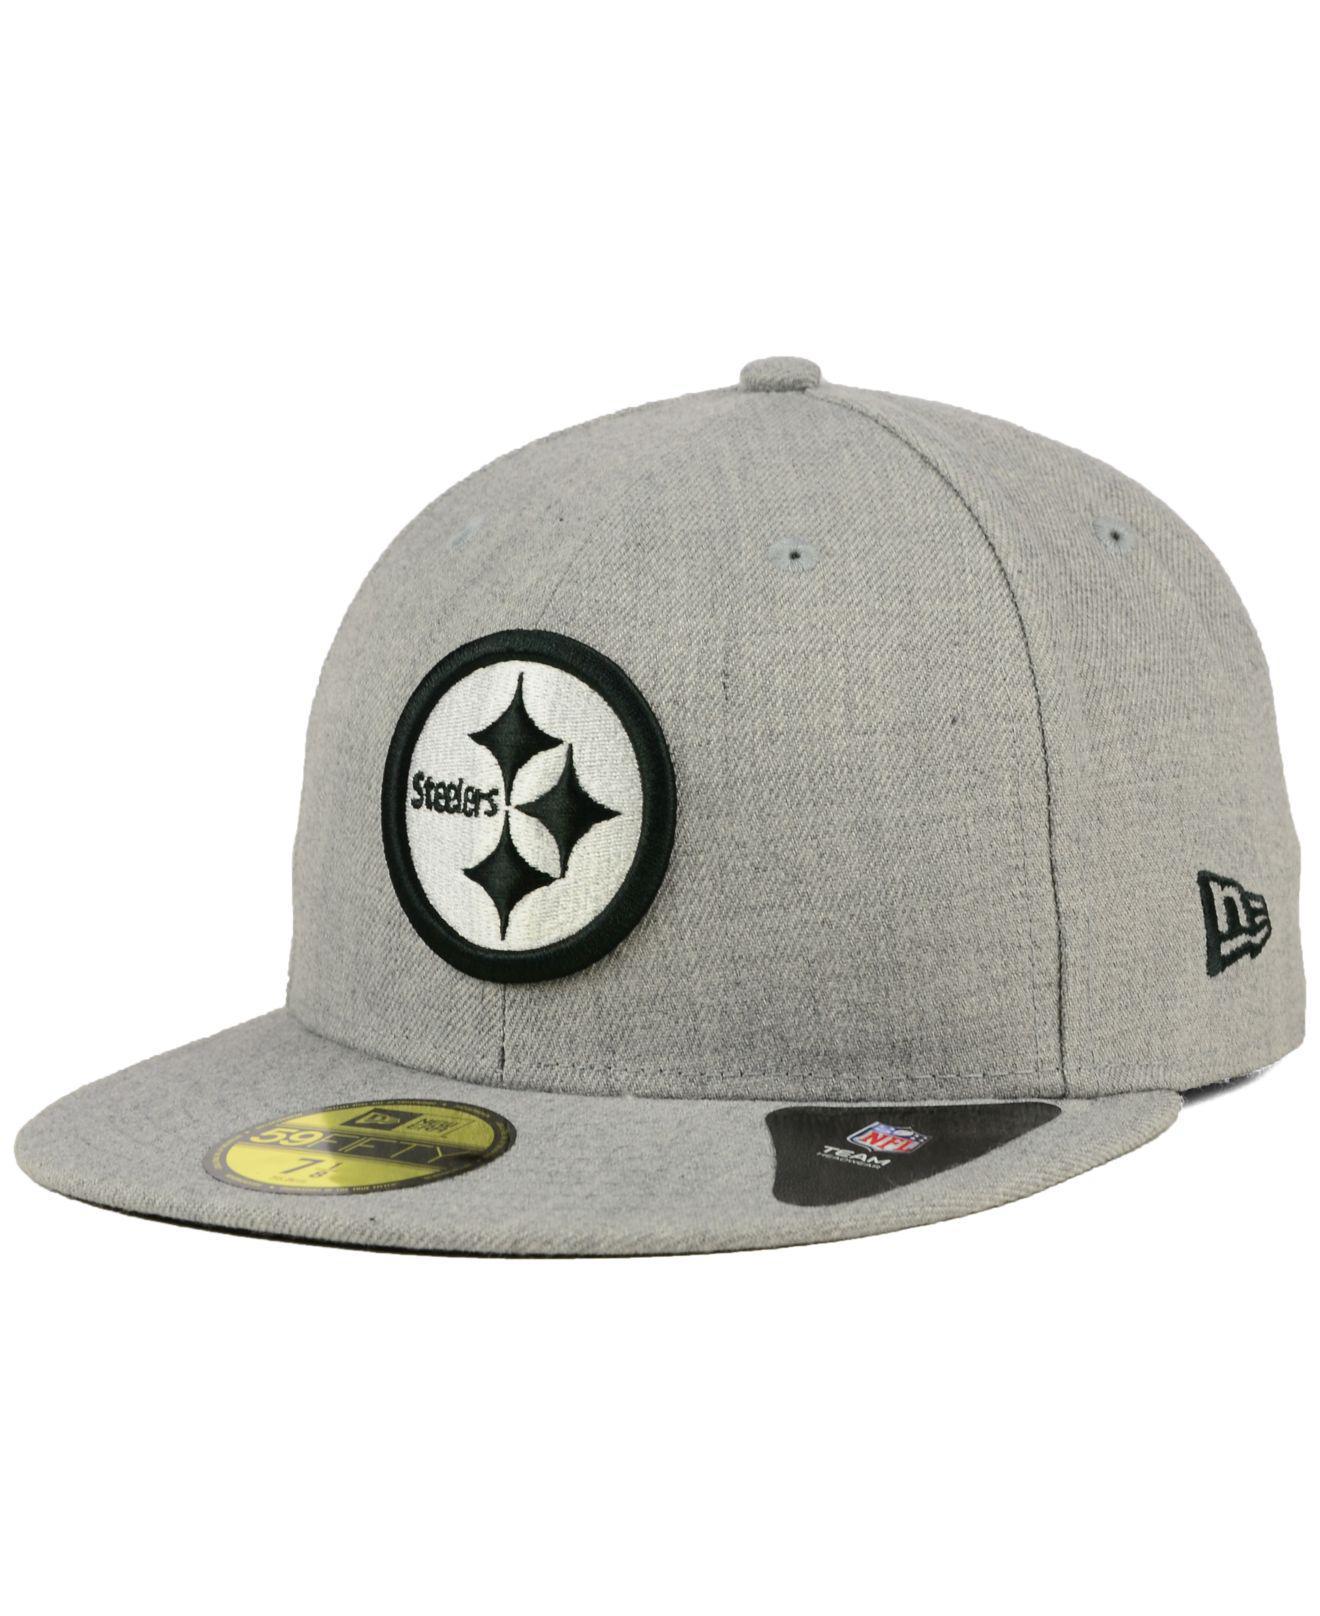 Lyst - Ktz Pittsburgh Steelers Heather Black White 59fifty Cap in ... 28dd014da